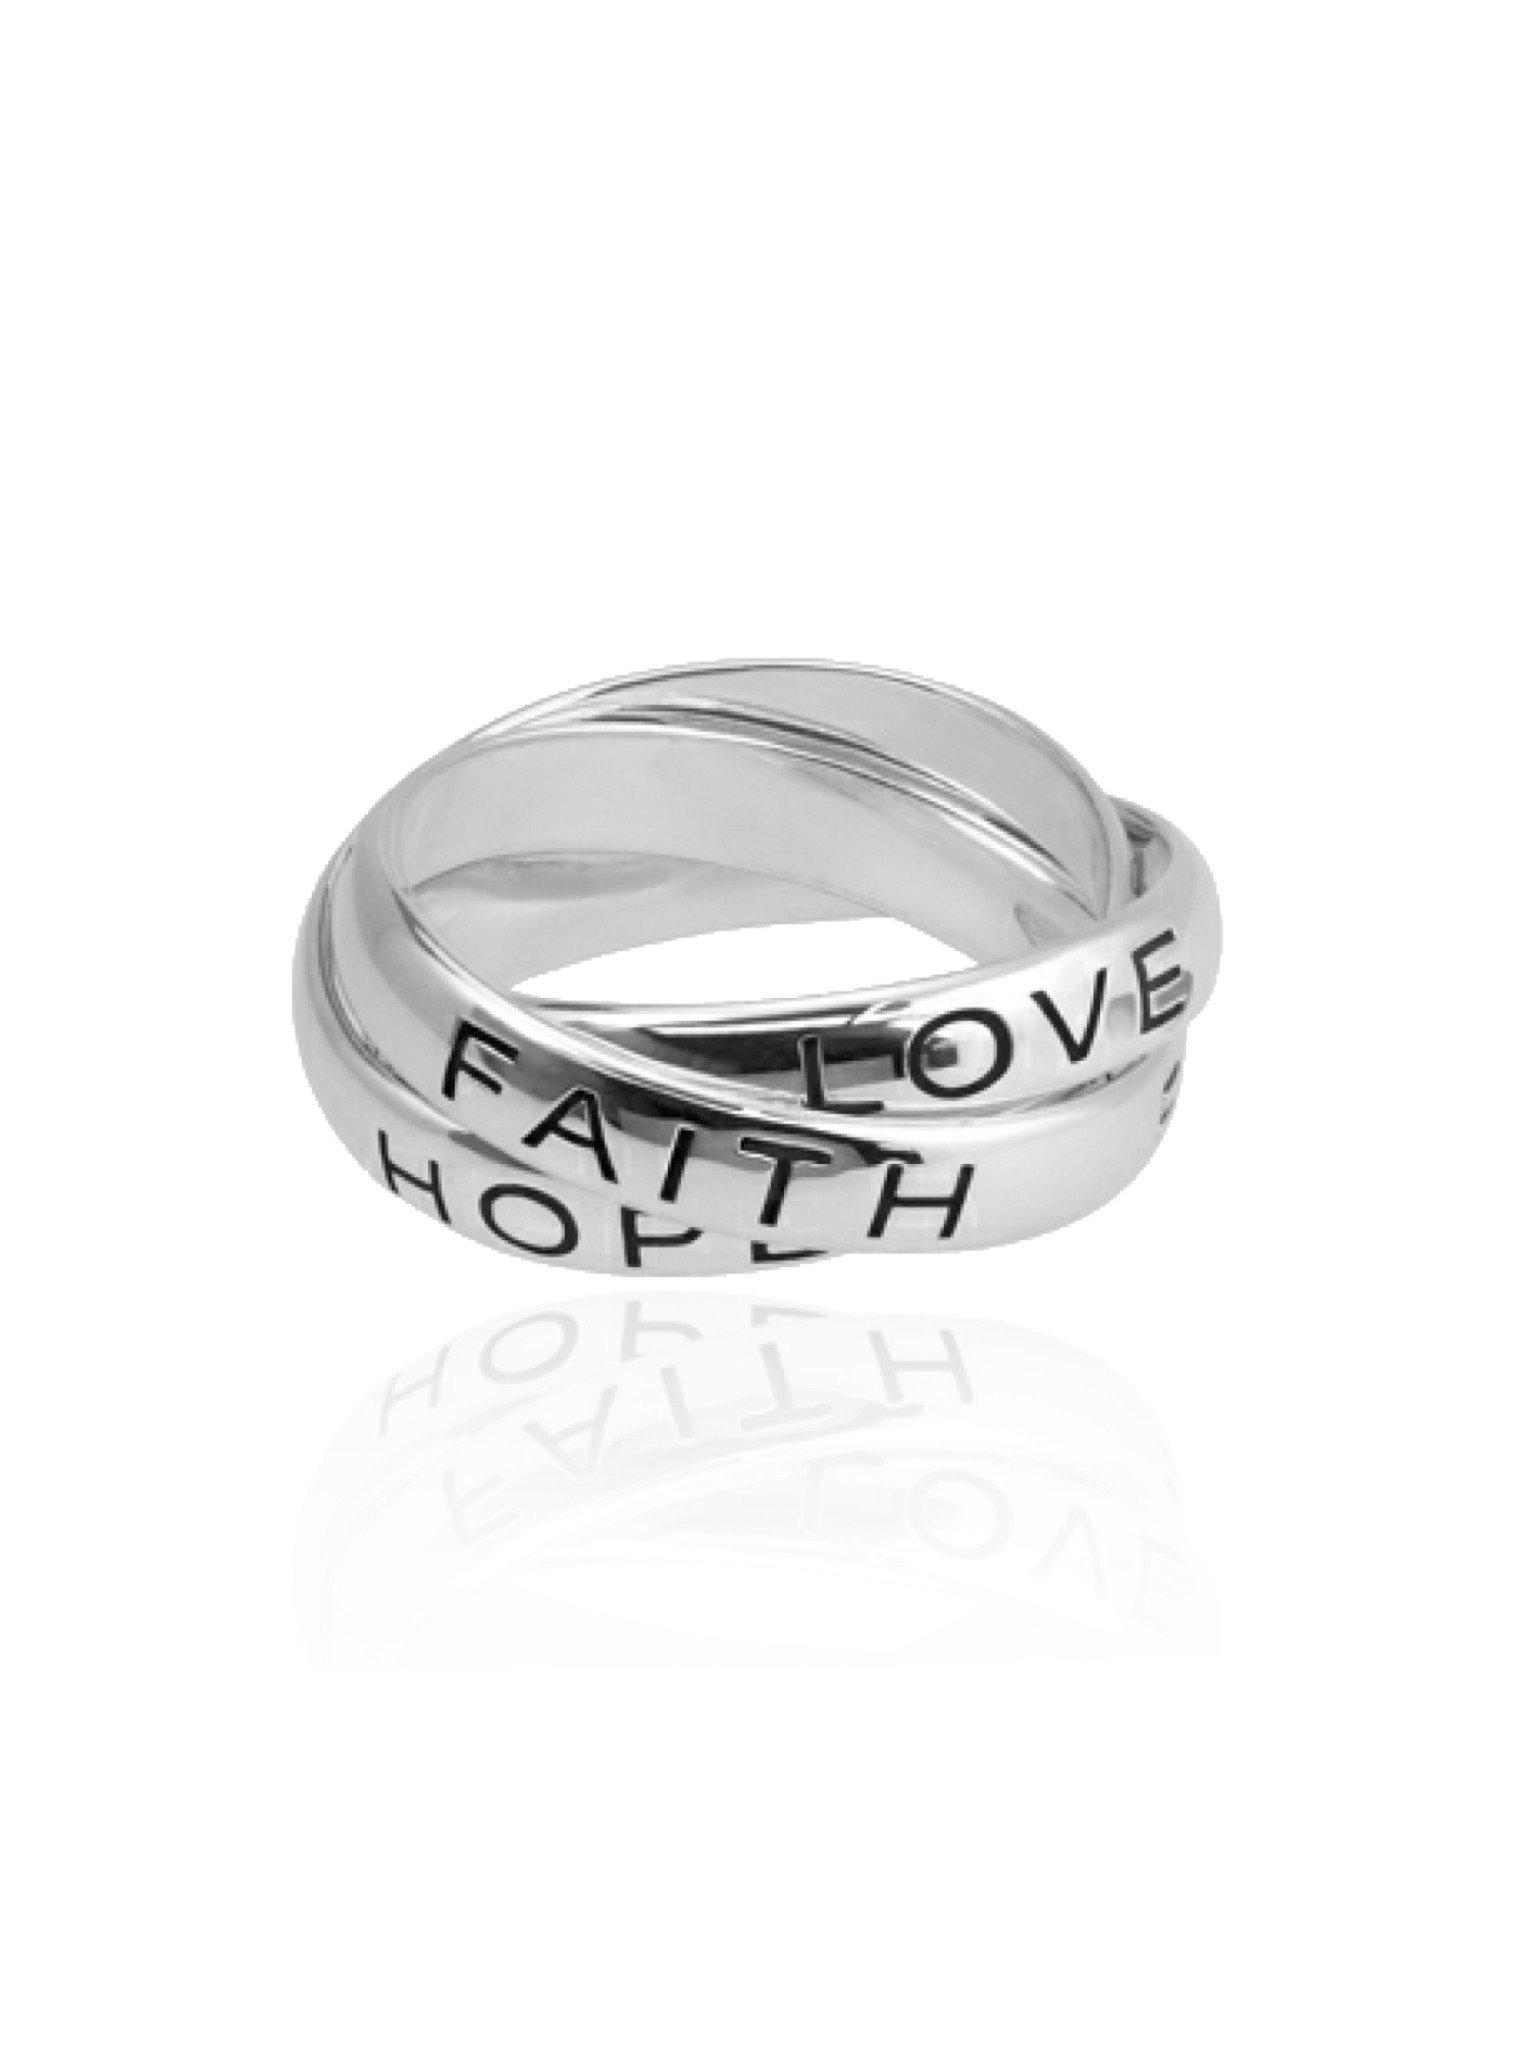 Russian Faith Hope Love 3 Band Ring